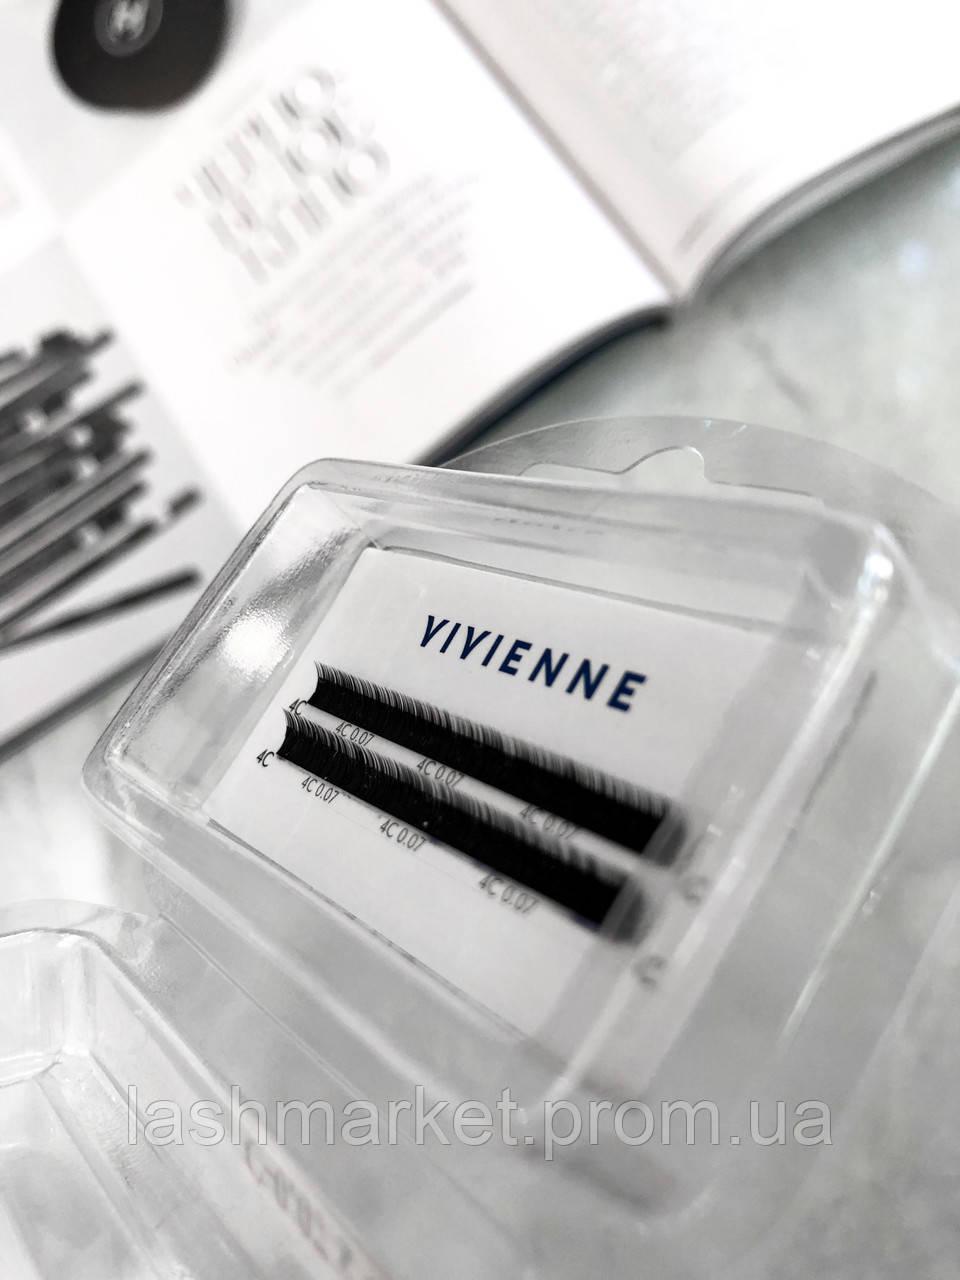 Ресницы 2 ленты С 0.07(7 мм) Vivienne elite чёрные